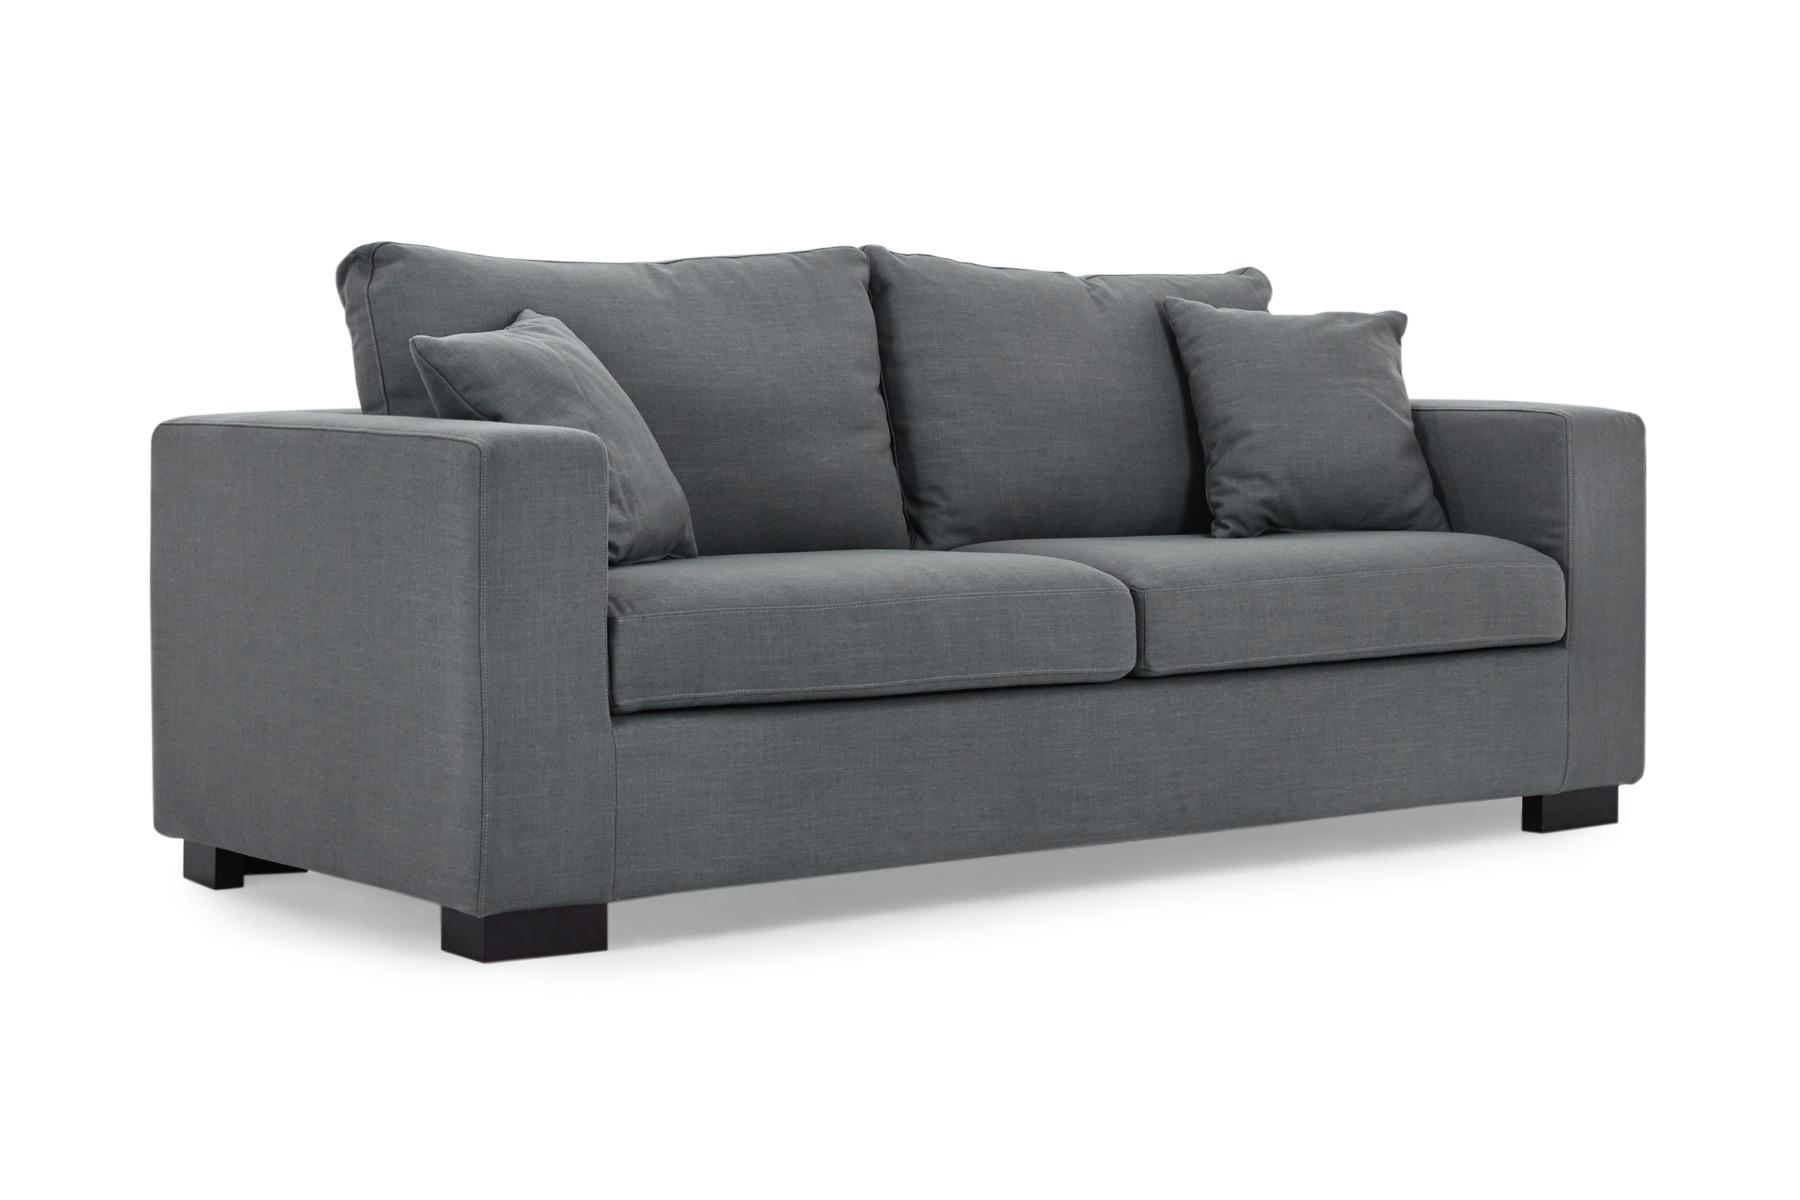 Full Size of Sofa Mondo 2 Agata Meble 3 Brick Srl Bertinoro Kaufen Bed Erfahrungen Group Couch Leder Online Mit Abnehmbaren Bezug Garnitur Stoff Grau Dauerschläfer Rattan Sofa Mondo Sofa